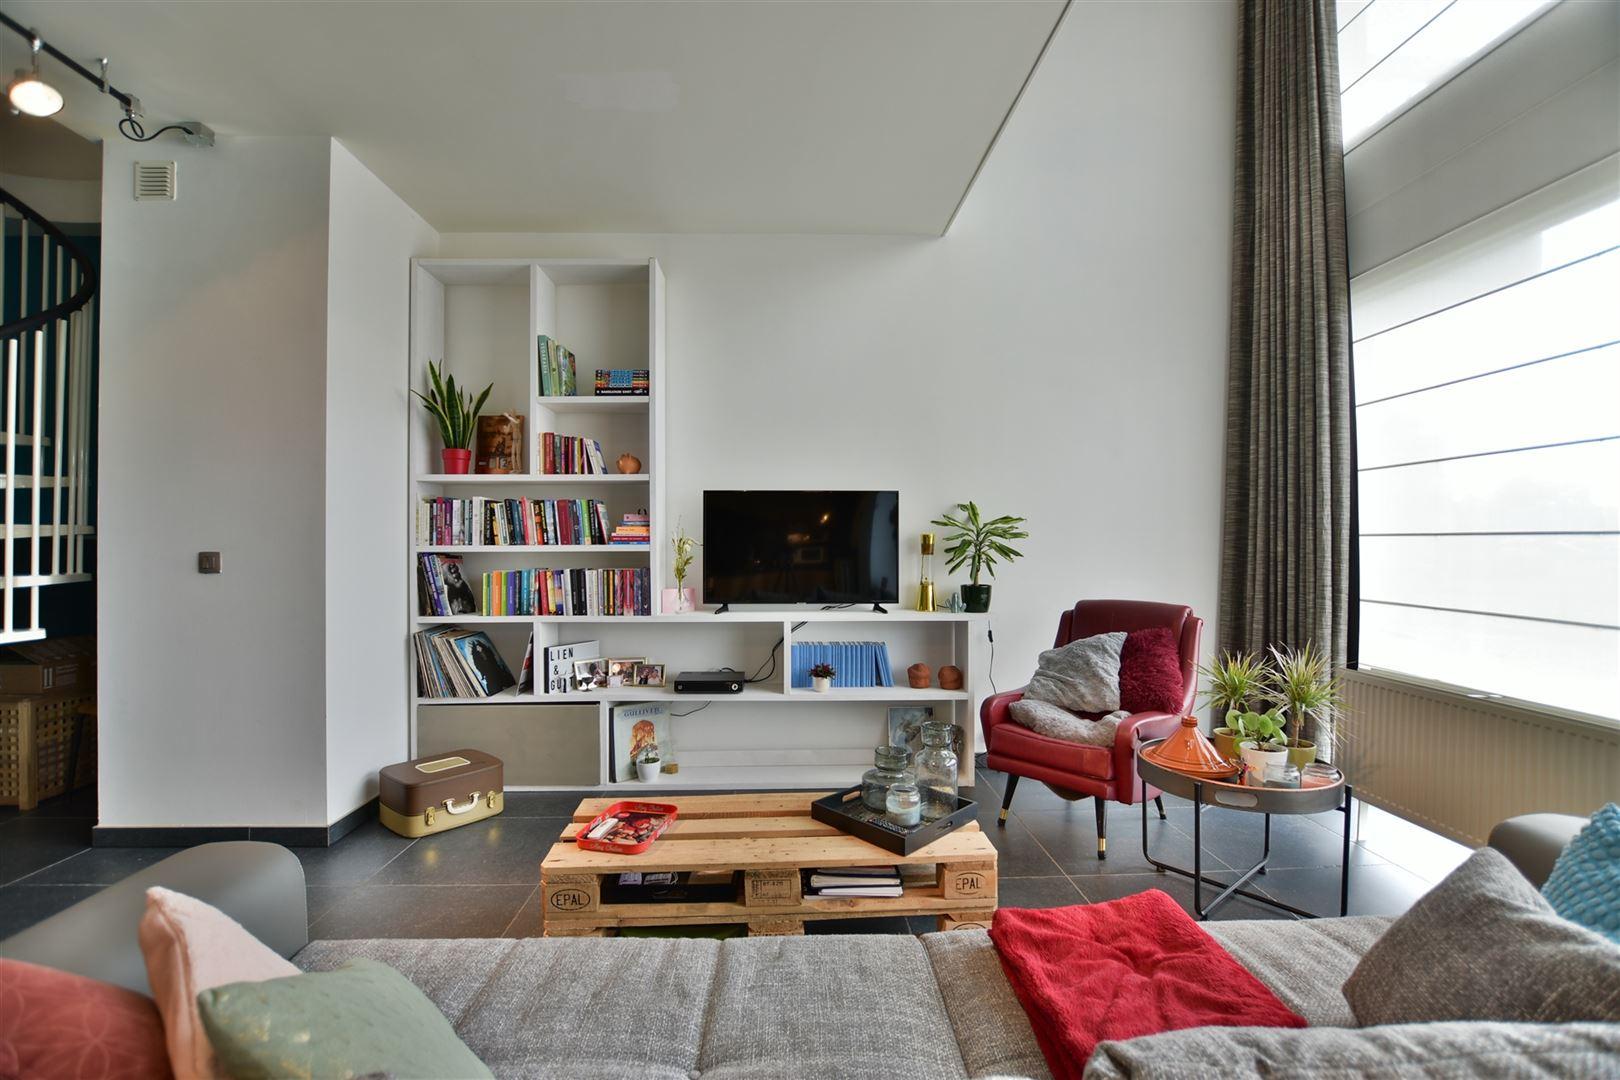 Foto 6 : Appartement te 9200 DENDERMONDE (België) - Prijs € 199.000